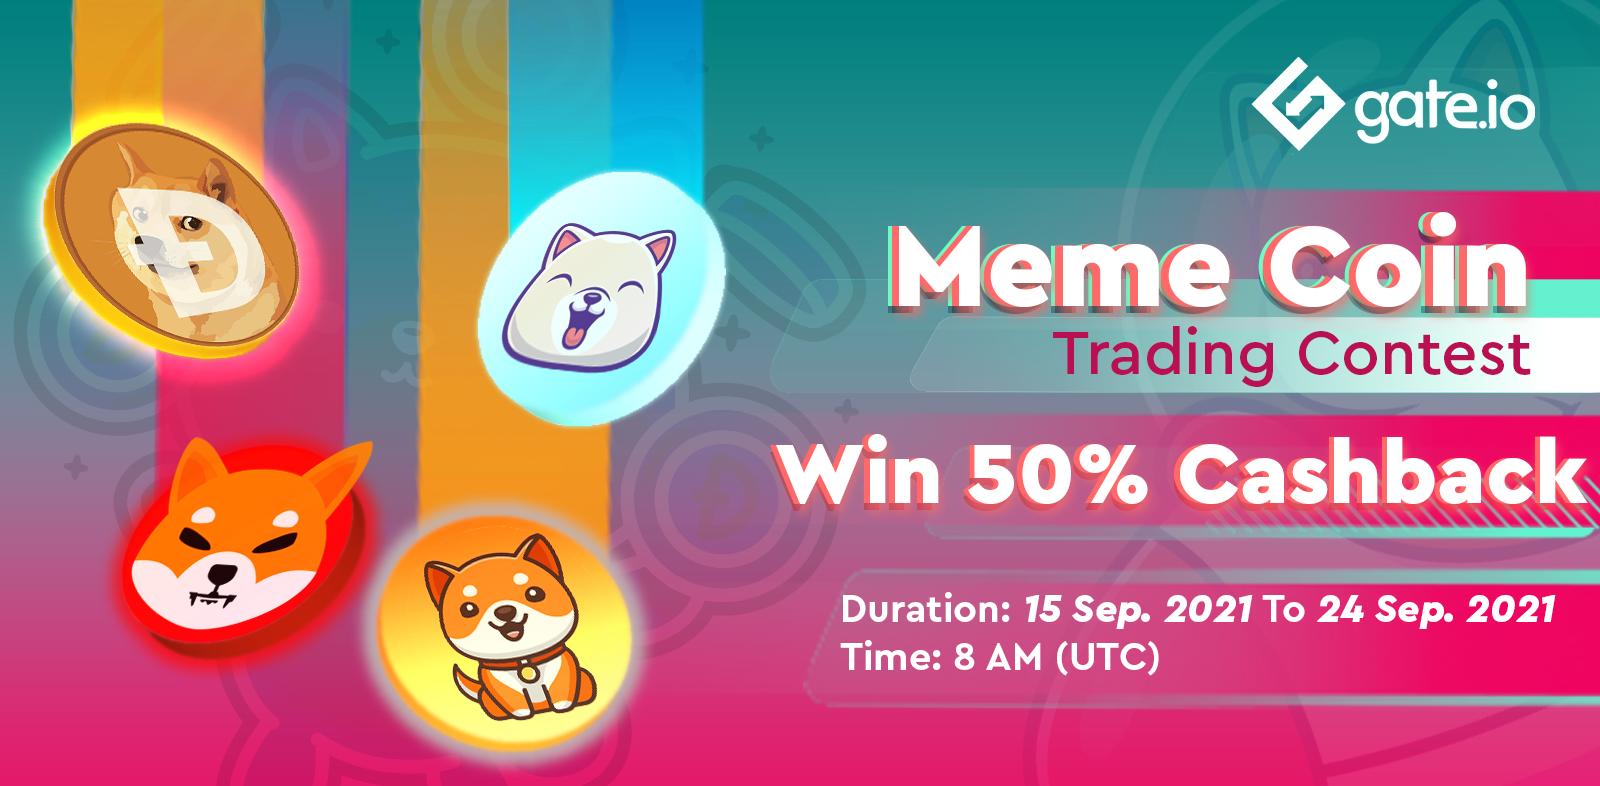 Gate.io Meme Coins Trading Contest | 50% Cashback | Gate.io